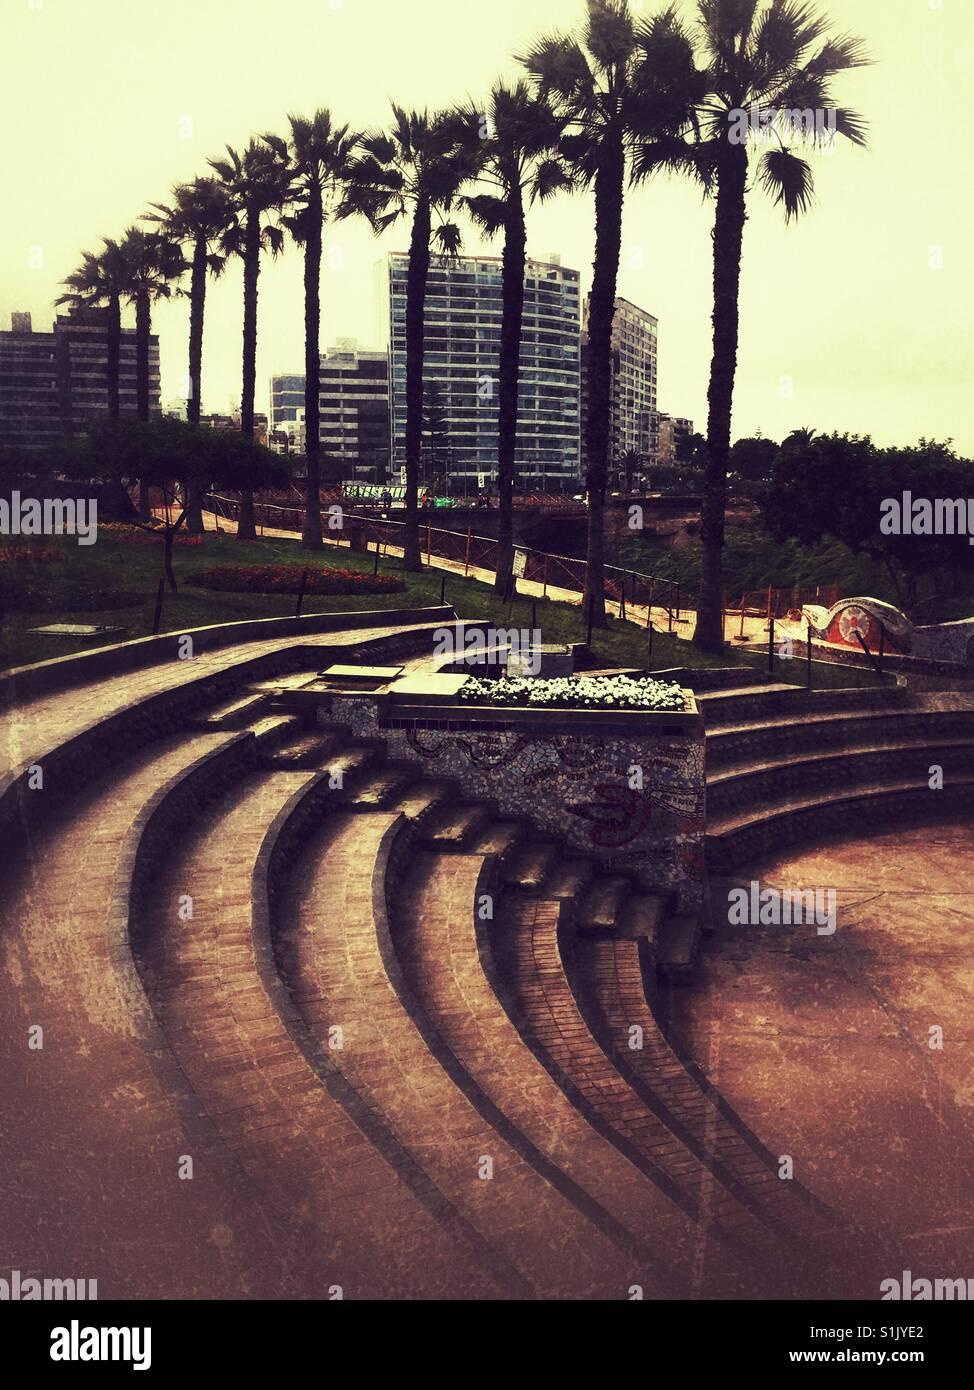 Runde Stufen am El Parque del Amor im Viertel Miraflores in Lima, Peru Stockbild